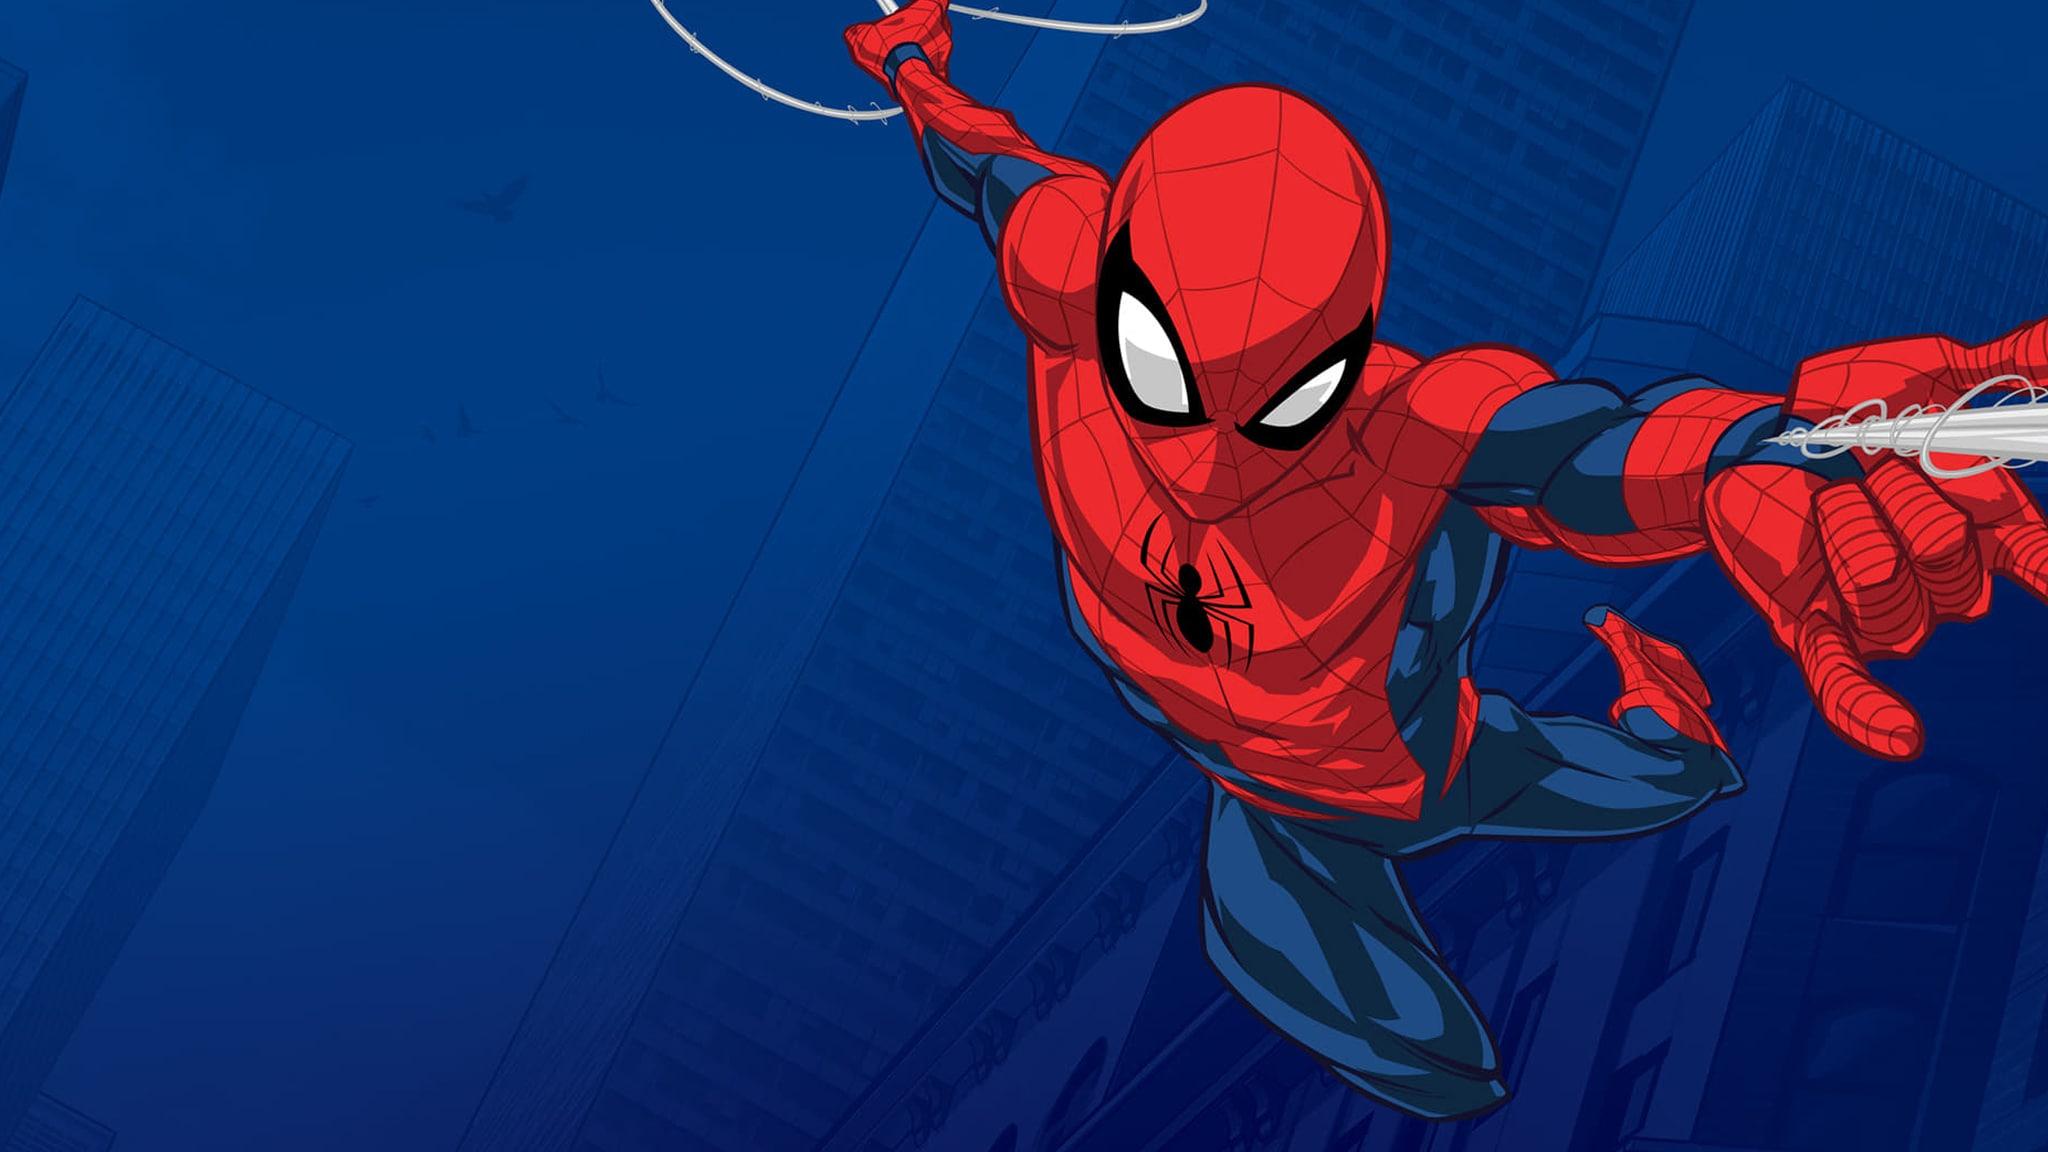 Rai Gulp Spider-man - Ep. 32